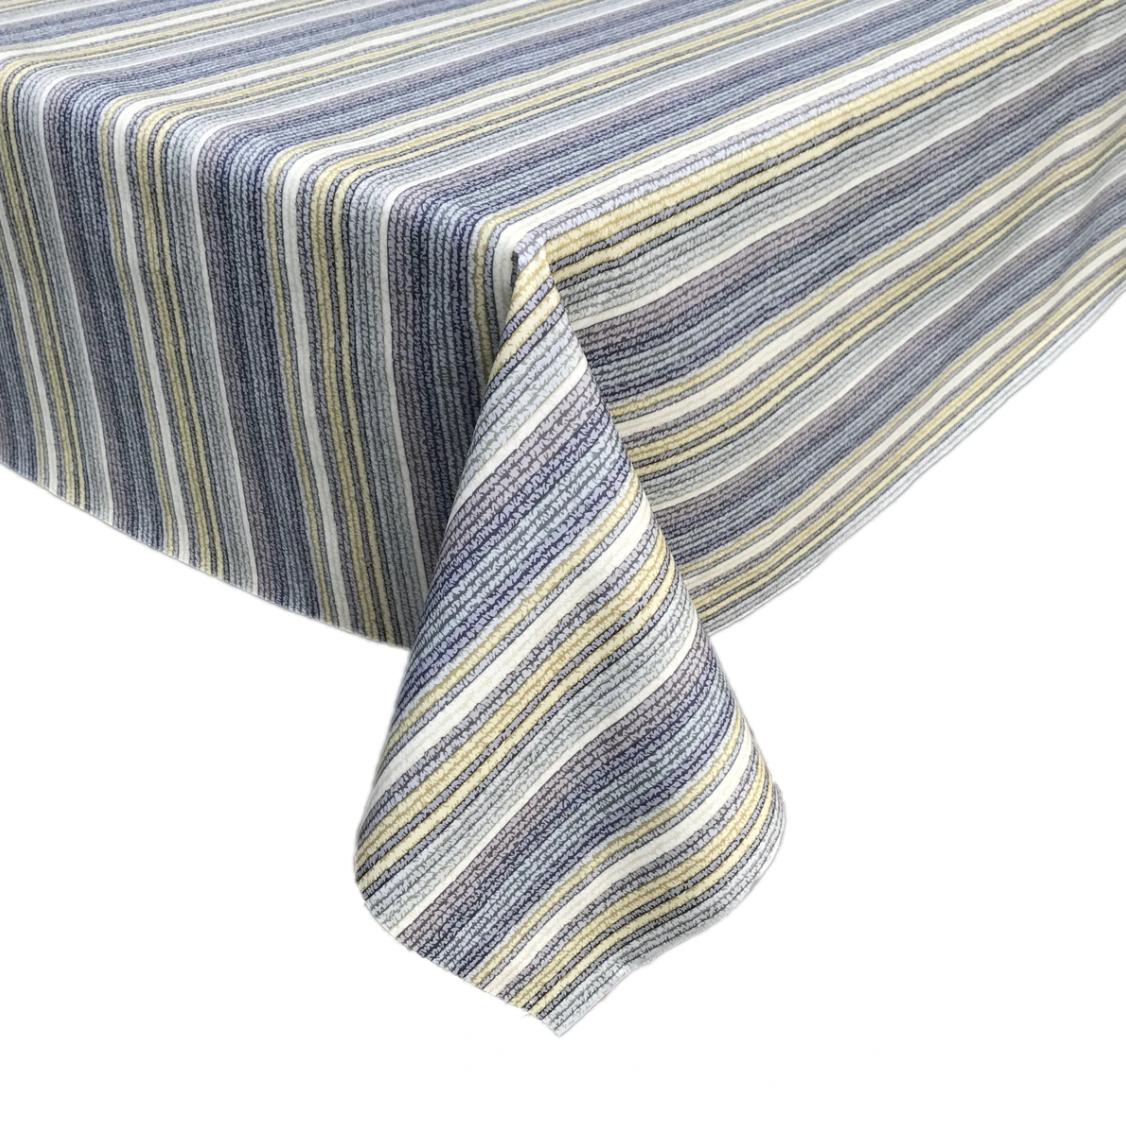 Splash Fabric Rectangular Oilcloth Tablecloth: Malibu (Cool)